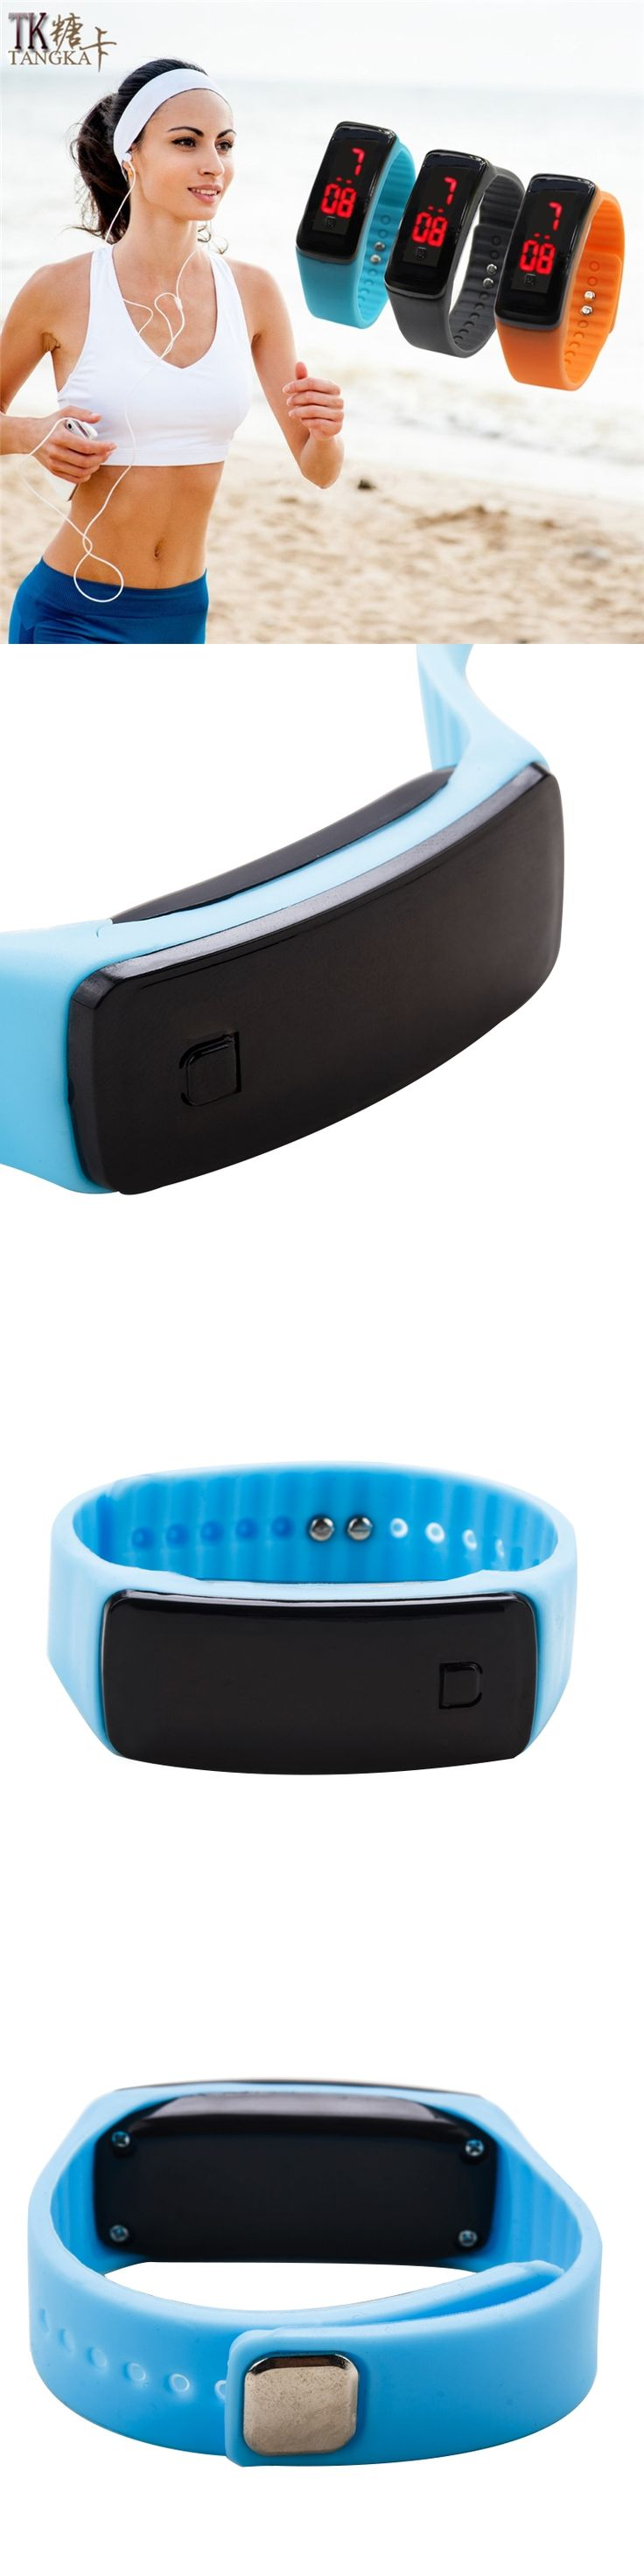 Hot LED Watch women and Men Sports Digital Wrist Watches Fashion rubber bracele tmontre digital watches Reloj Hombre